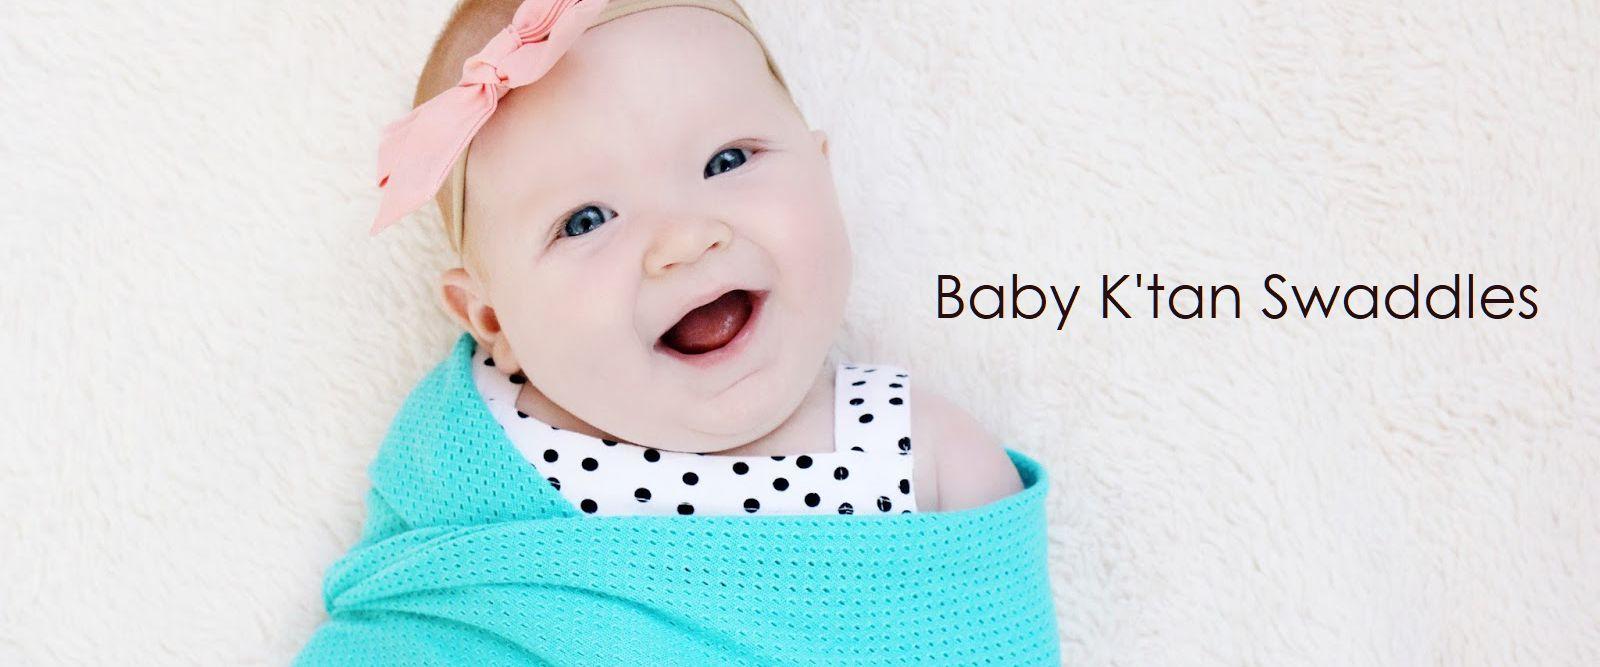 Baby Ktan 3 In 1 Bundle Happy Coast Kids Carrier Active Black Xs Slider Swaddle 11